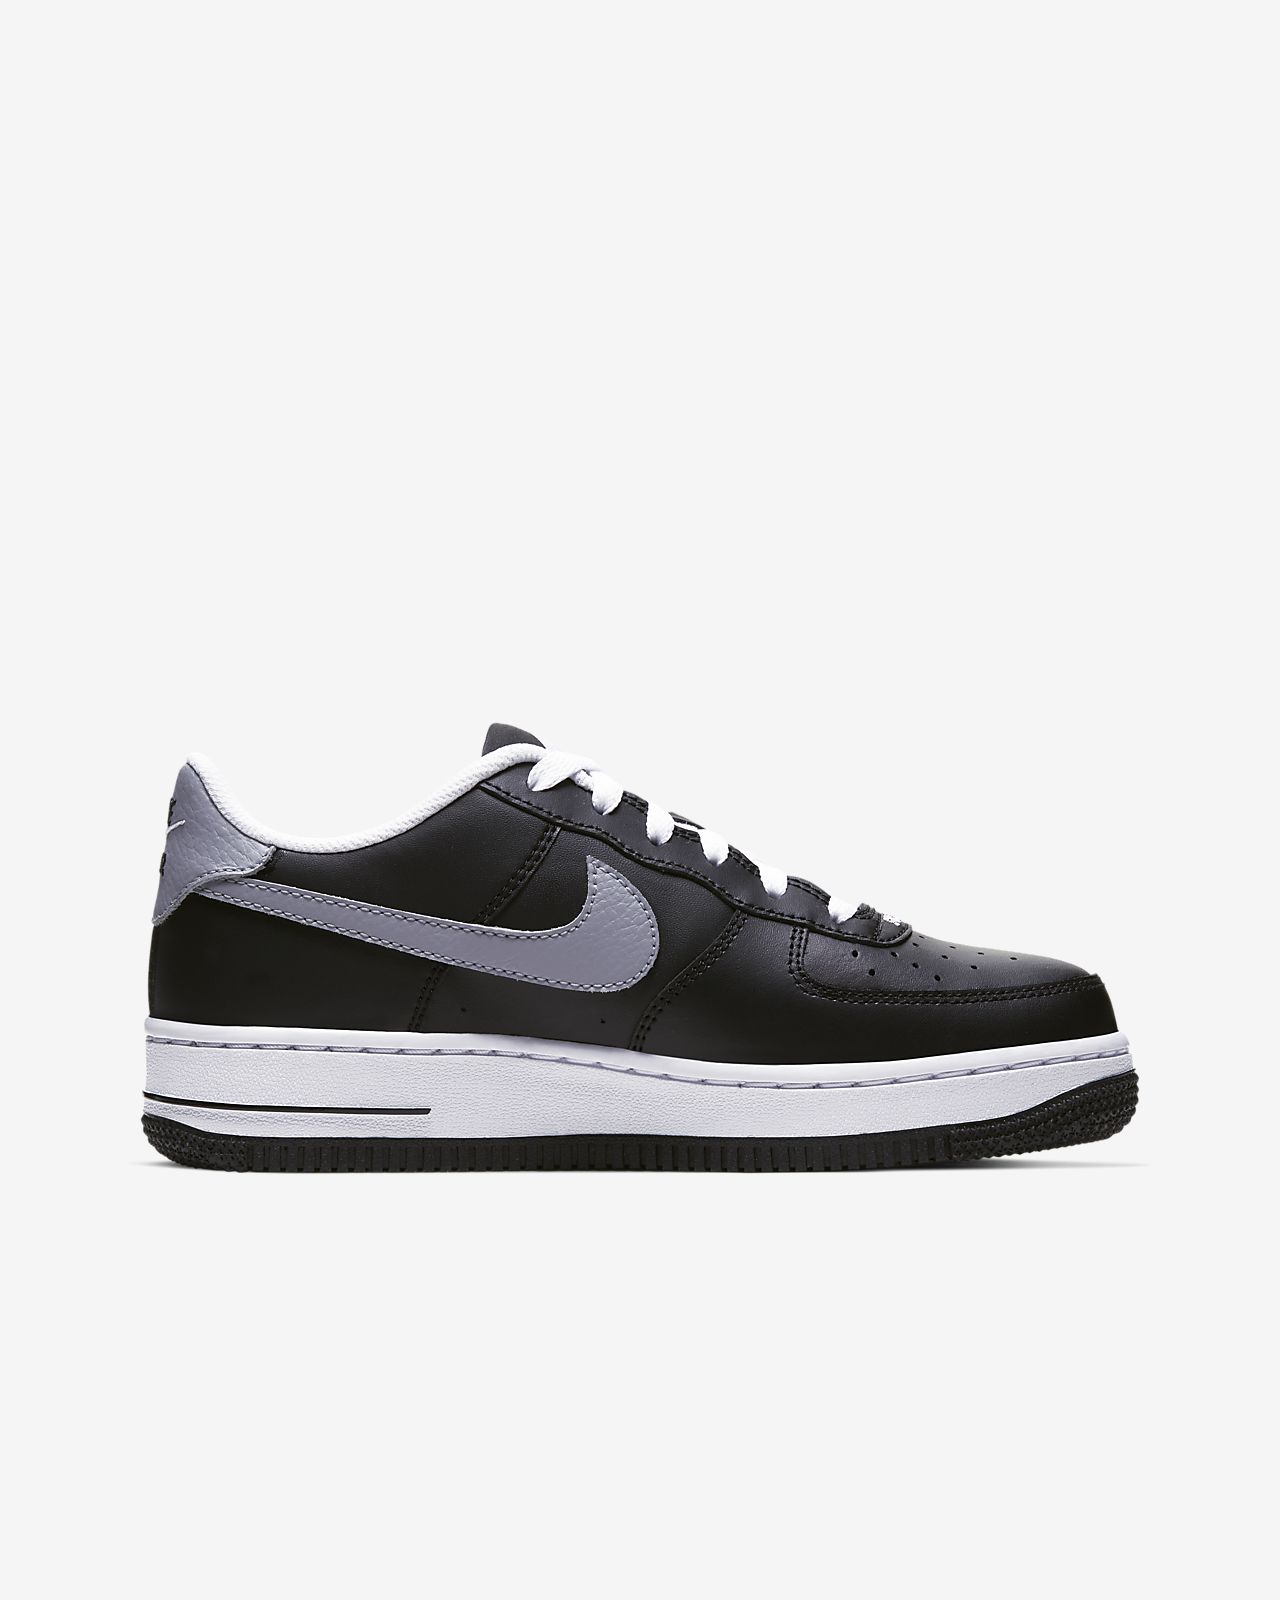 Modische Stil Nike Schuhe Sale: Nike Air Force 1 07 Shoe